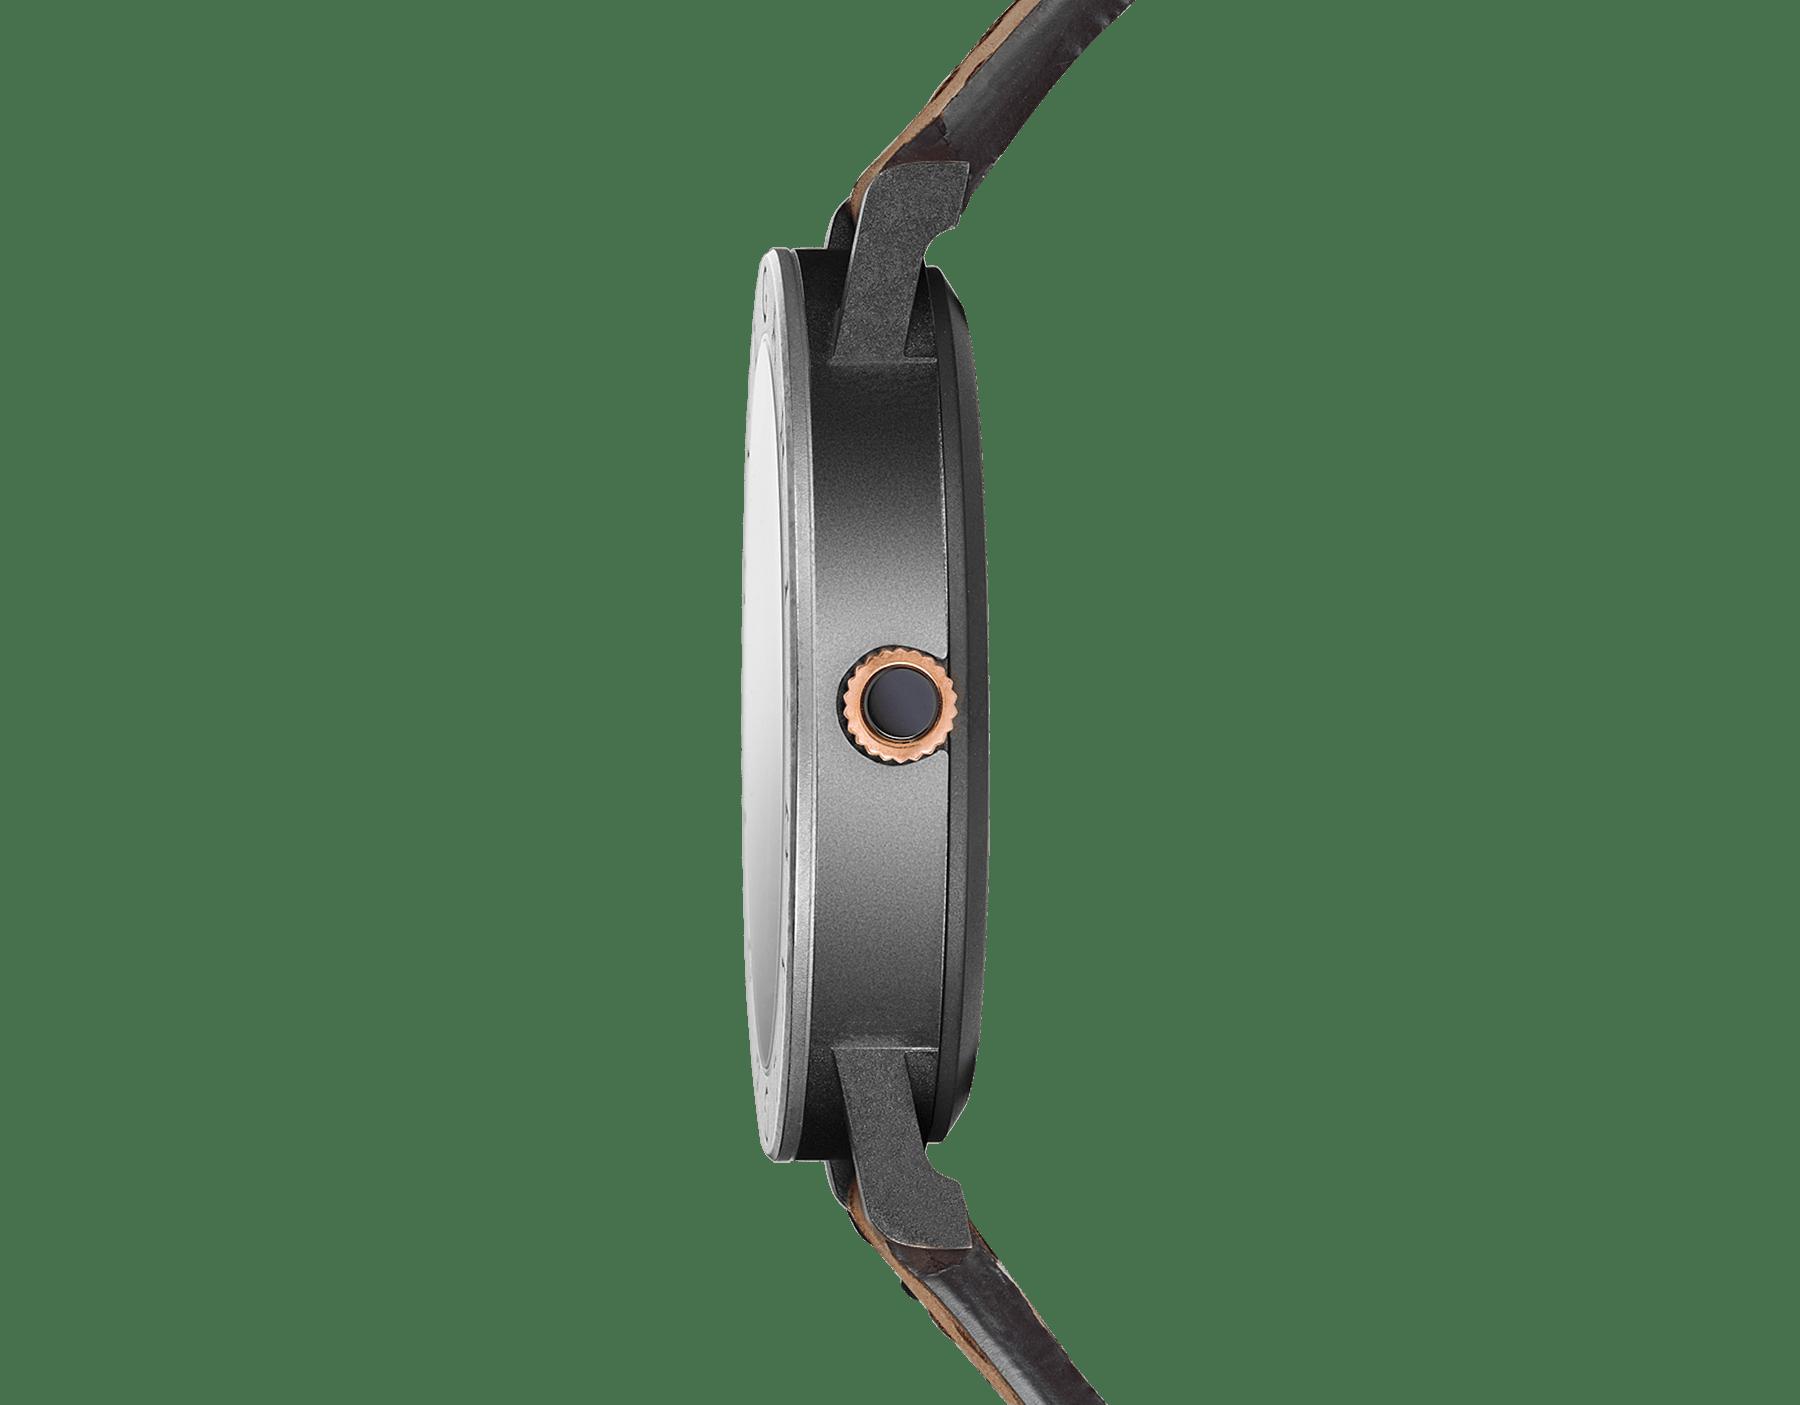 "BVLGARI BVLGARI都市特别版ROMA腕表,搭载品牌自制的自动上链机械机芯,精钢表壳经黑色DLC高耐磨处理,表圈镌刻""BVLGARI ROMA""字样,透明表背,黑色漆面粒面表盘,玫瑰金时标,棕色小牛皮表带和可替换的黑色橡胶表带。 103219 image 5"